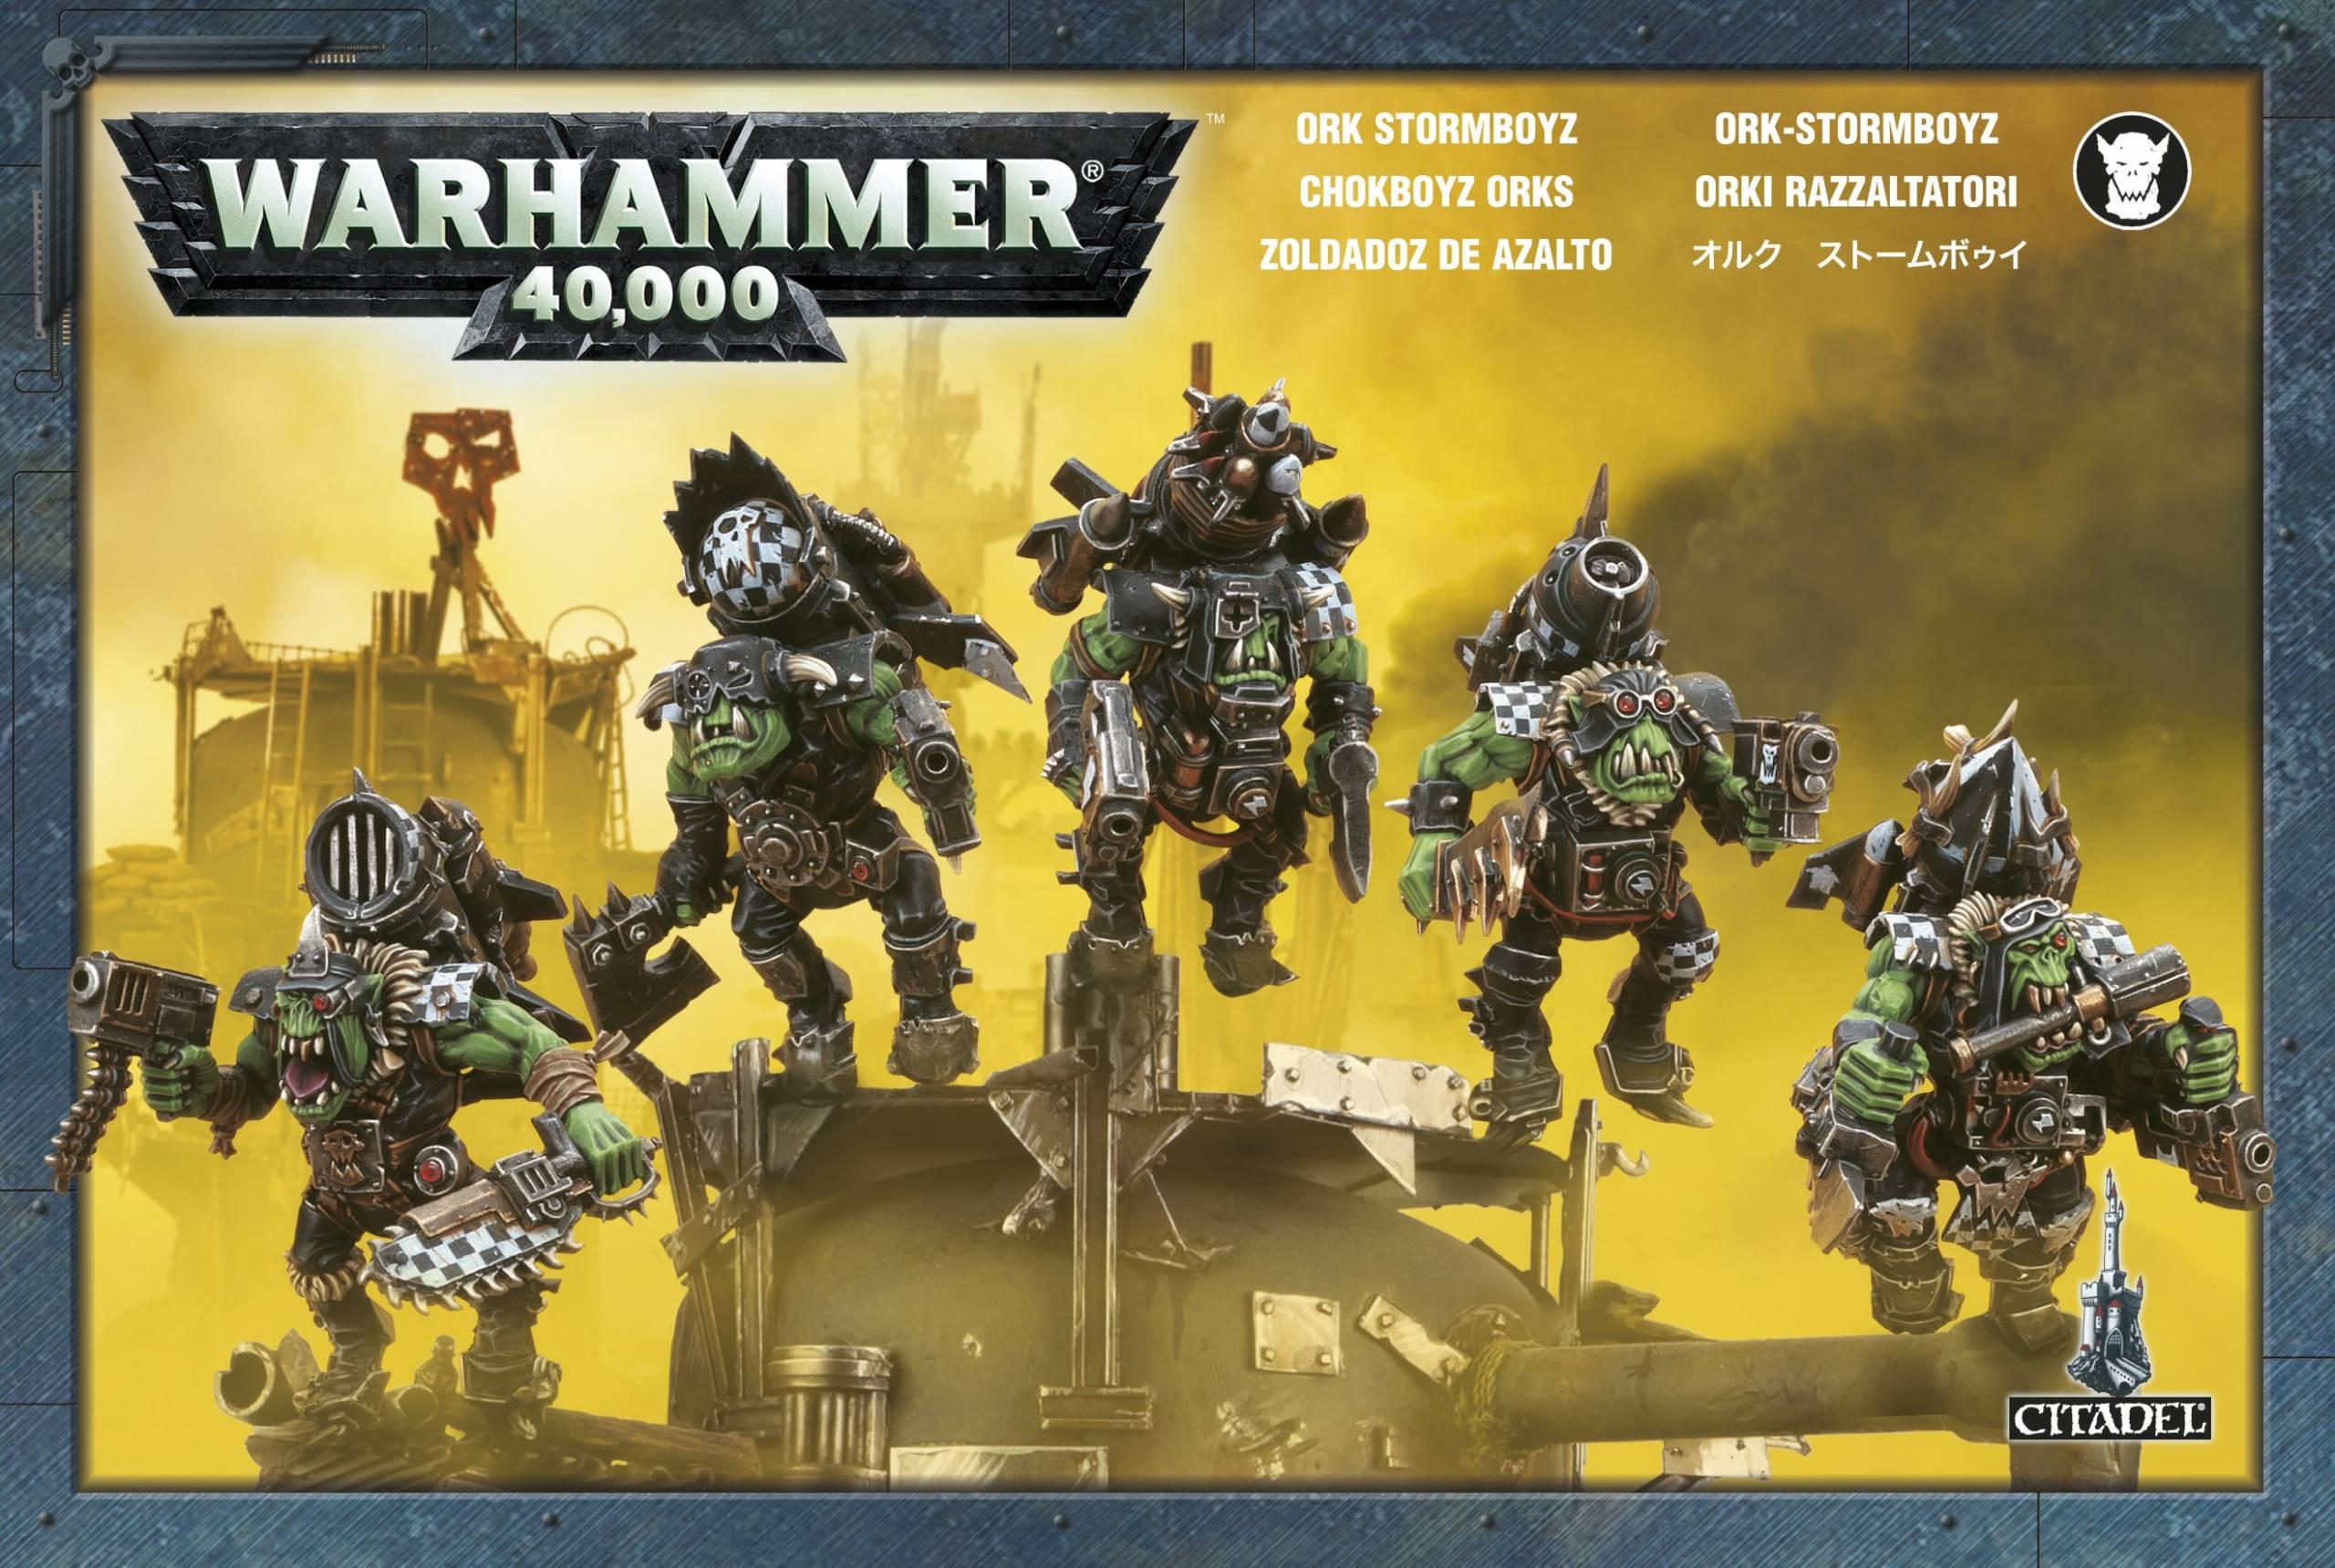 Ork: Stormboyz product image